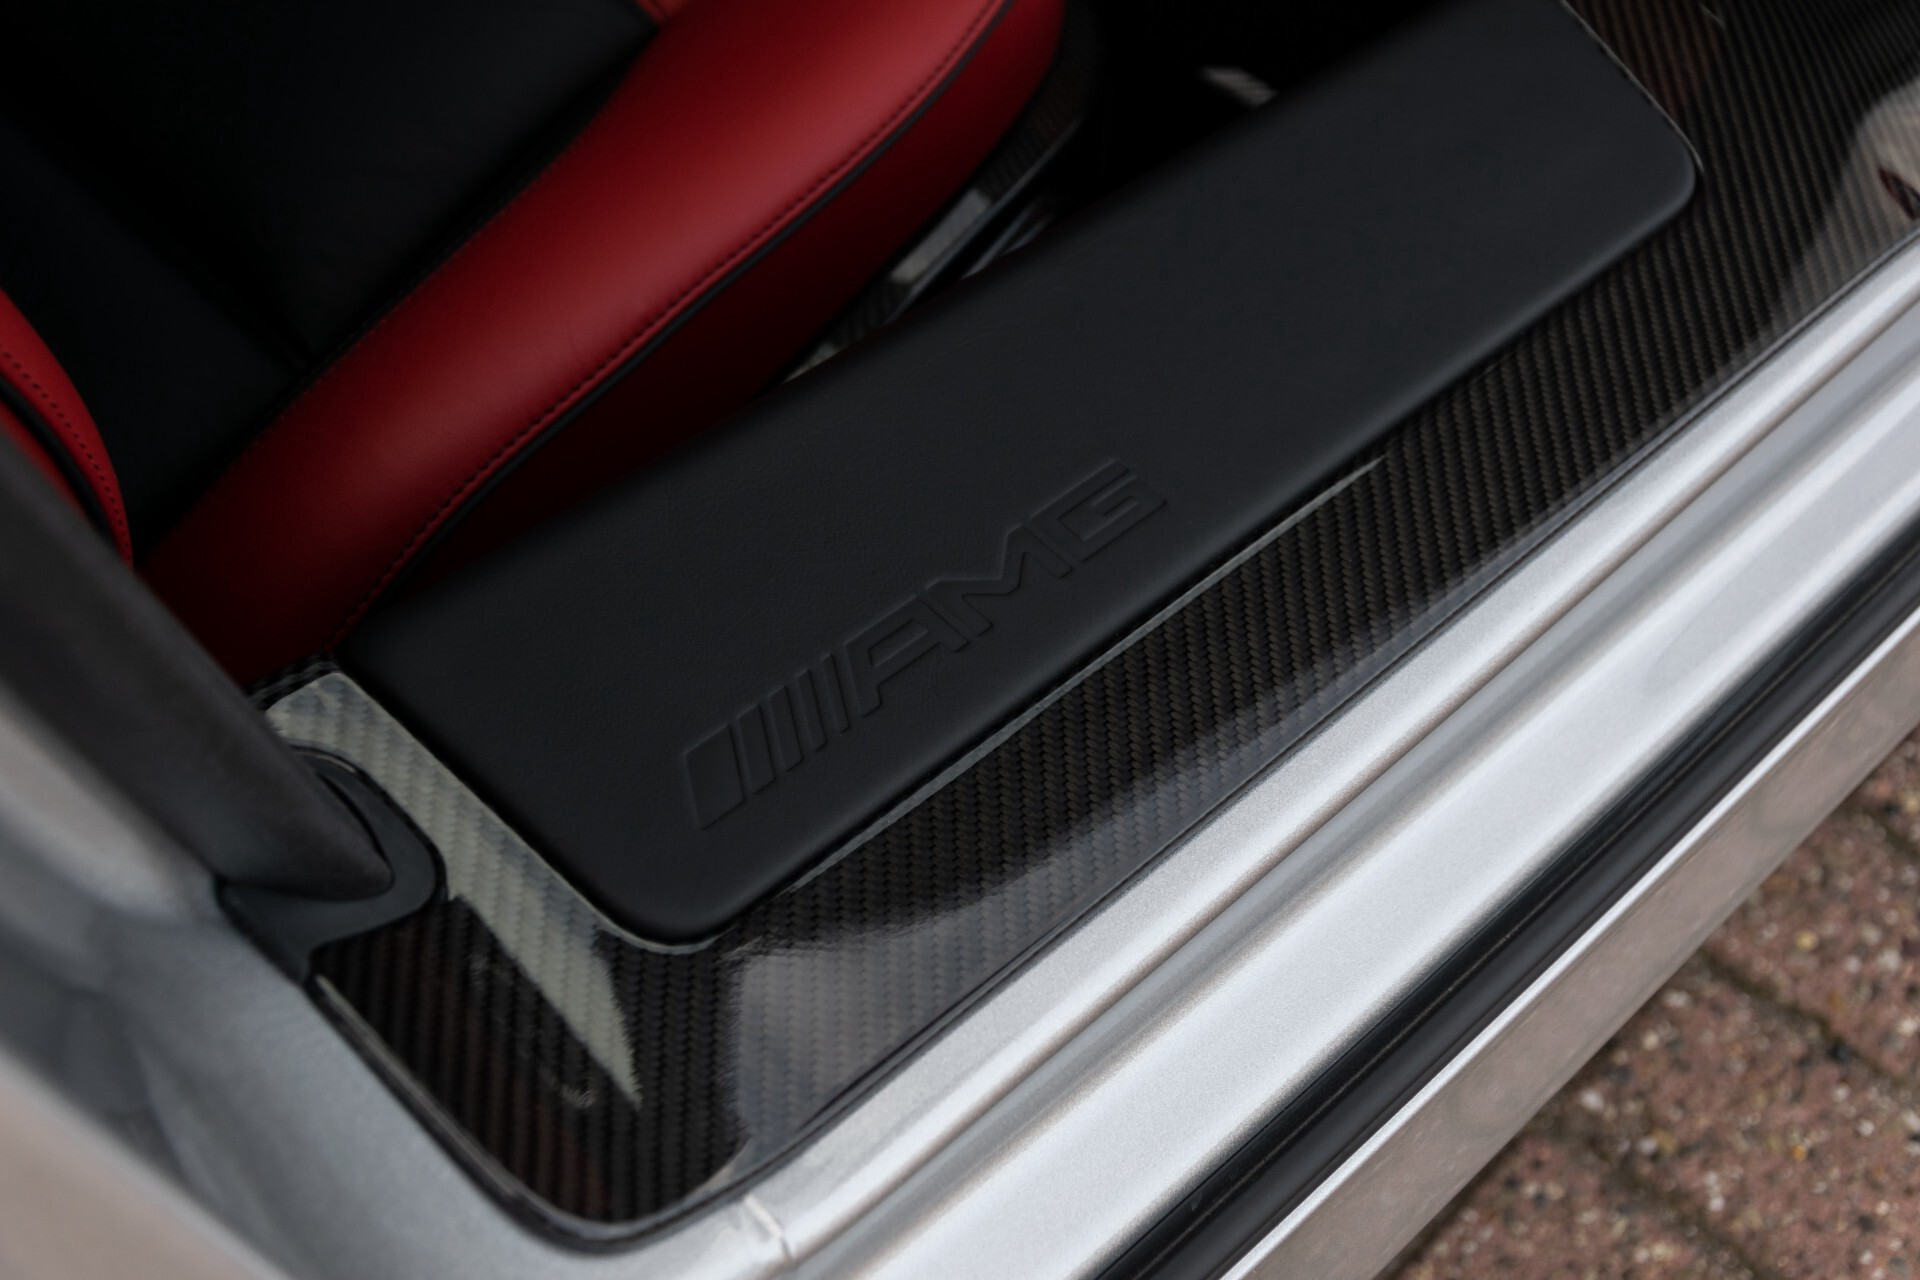 Mercedes-Benz SLS-Klasse Coupe 6.3 AMG 1ste eigenaar/NL Auto FULL OPTIONS Aut7 Foto 45